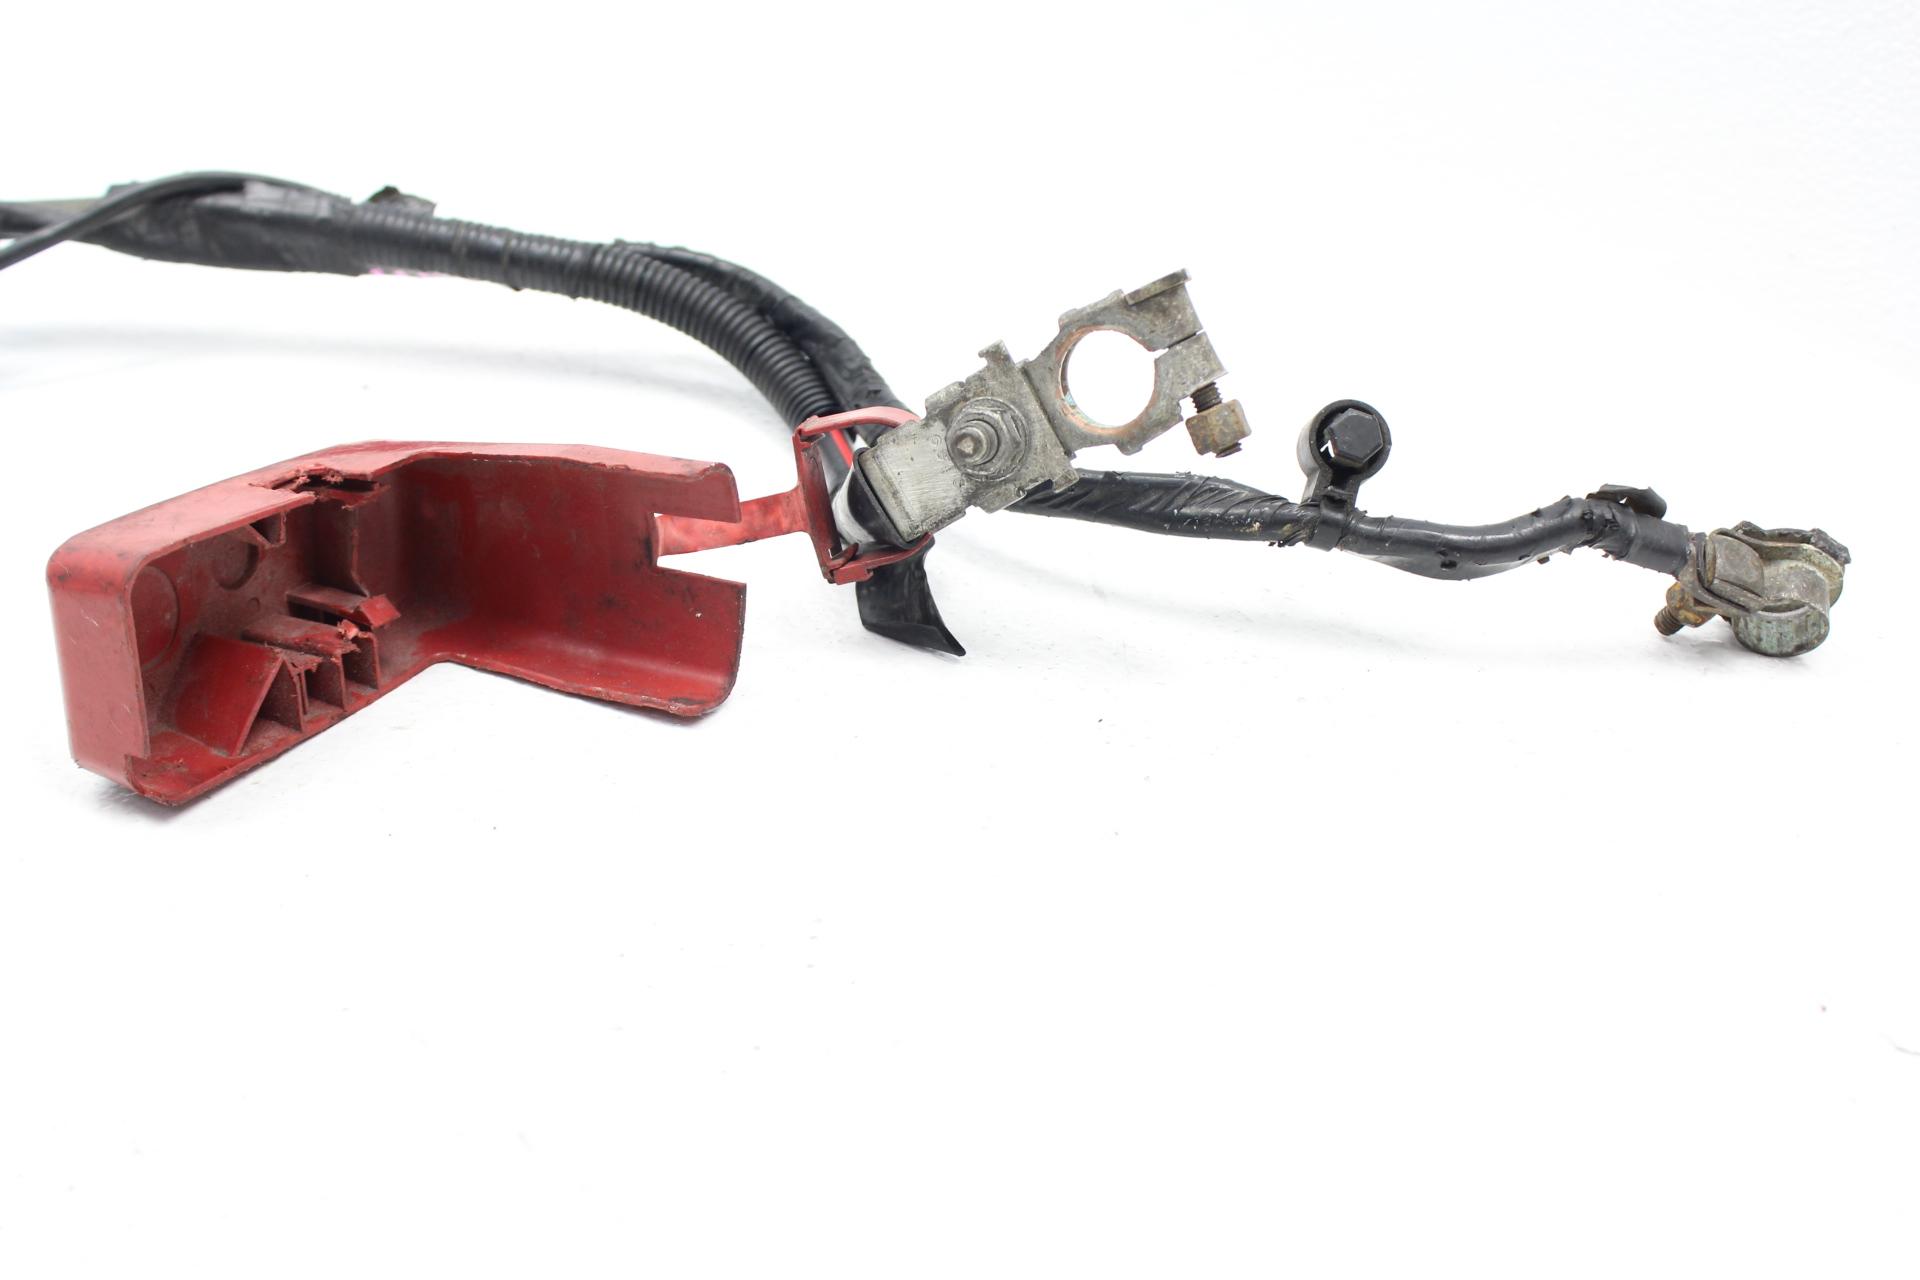 subaru alternator wiring harness 2012 2012 subaru impreza wiring harness 2008-2014 subaru impreza wrx & sti alternator battery ...